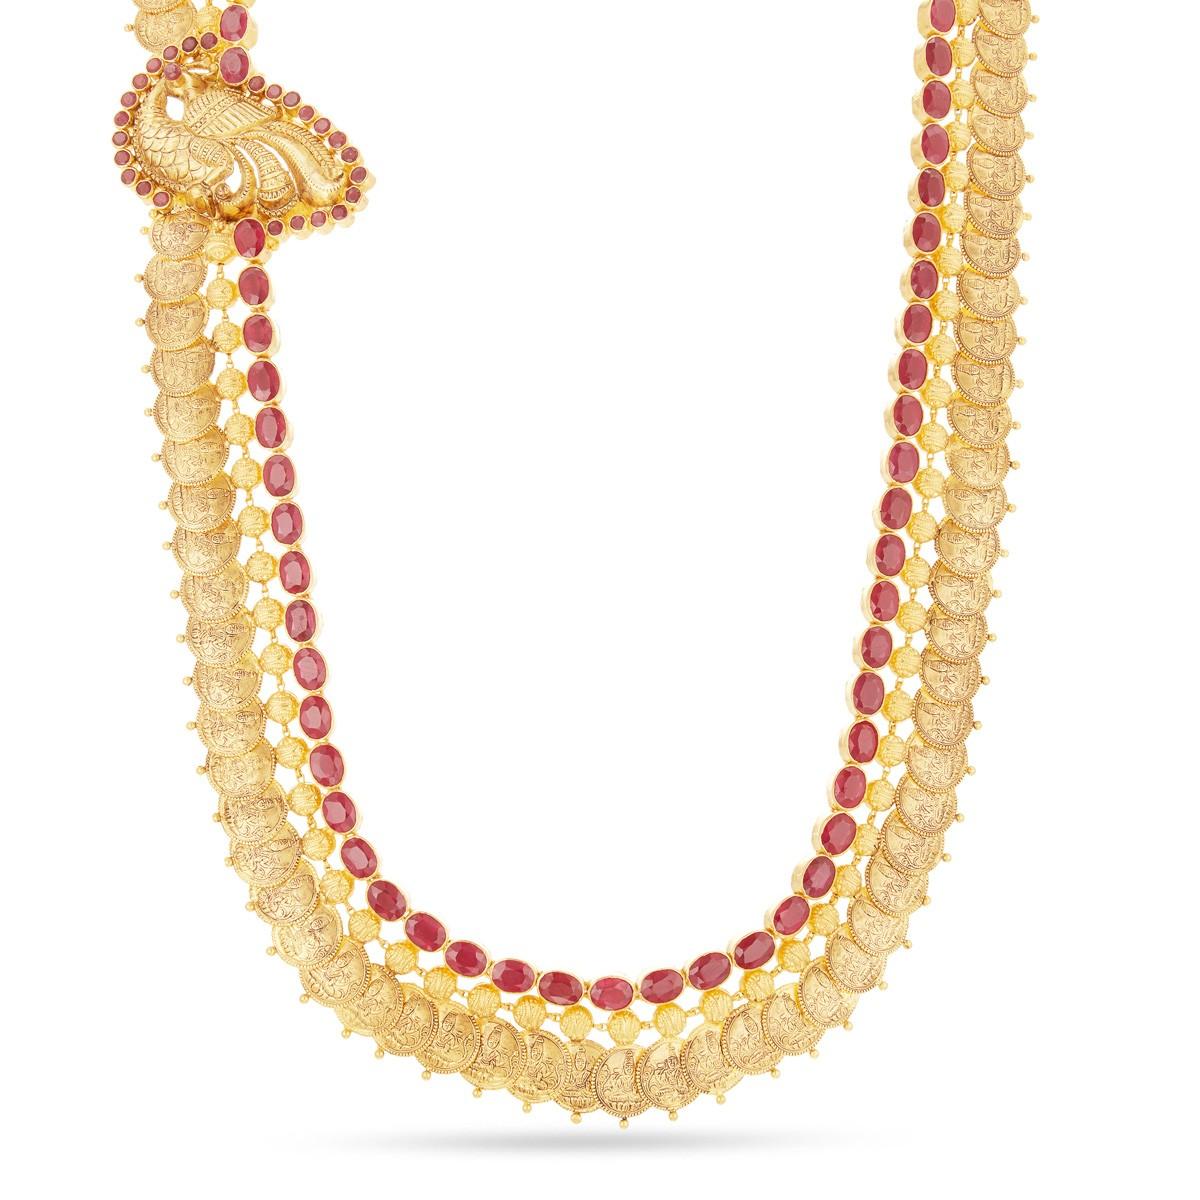 Nagas Design Gold Necklace | New Fancy Design Gold Necklace | Ruby ...